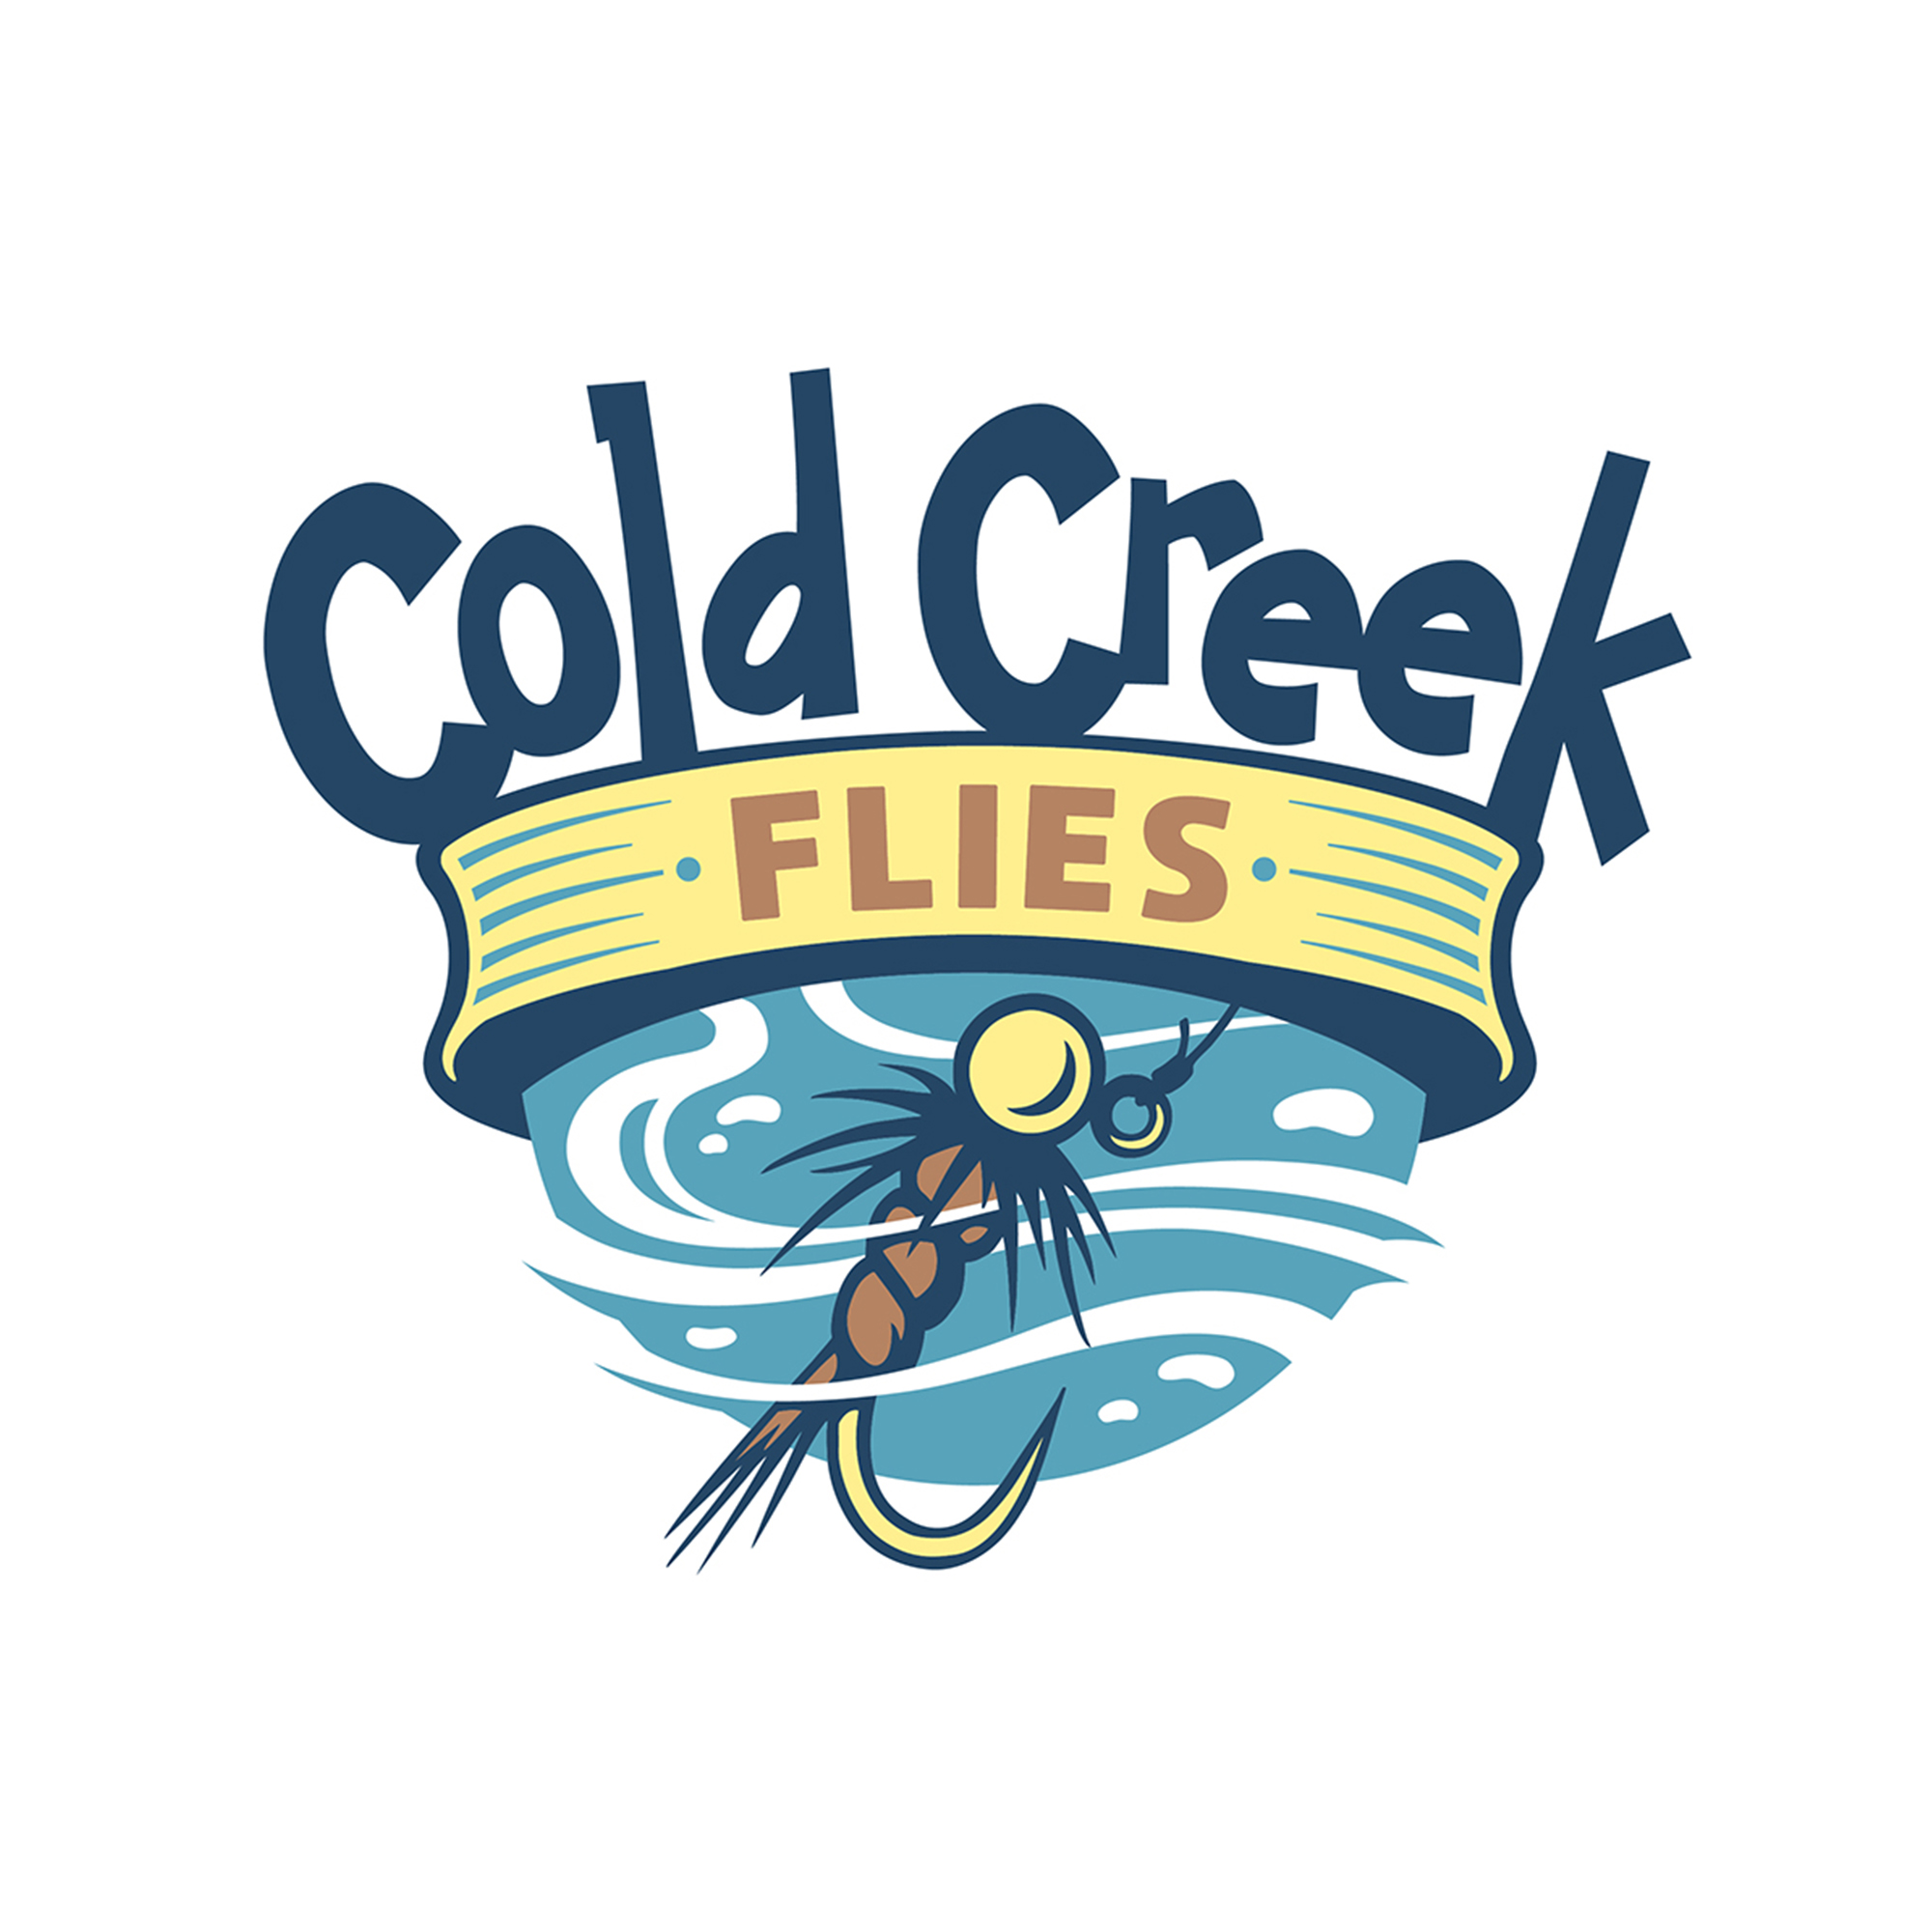 ColdCreekFlies2.jpg